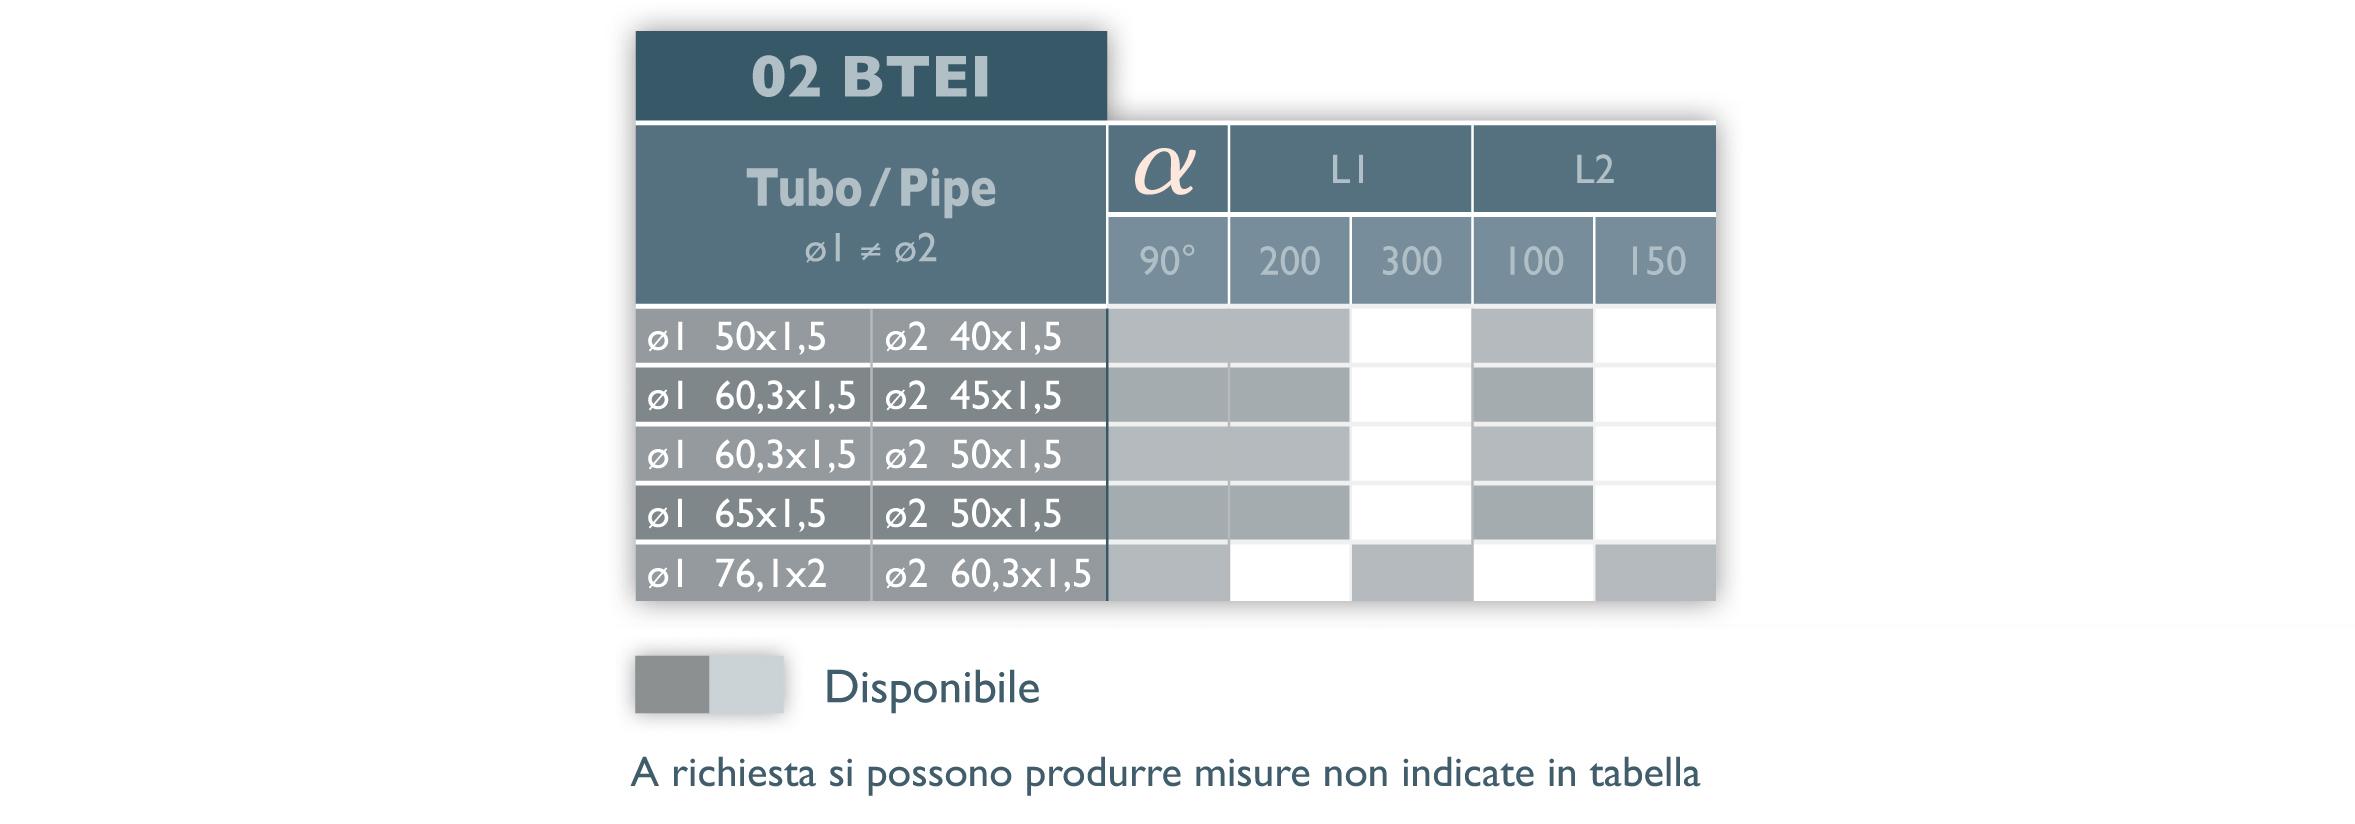 TABELLA RACCORDI INOX 304 BTEI